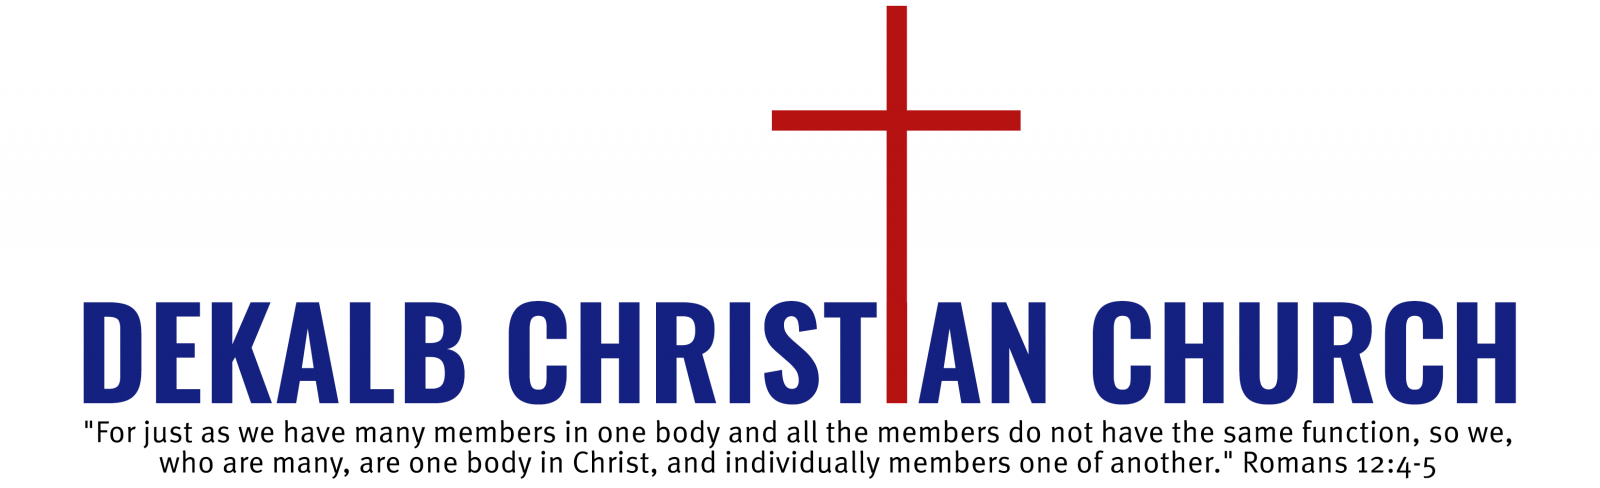 DeKalb Christian Church